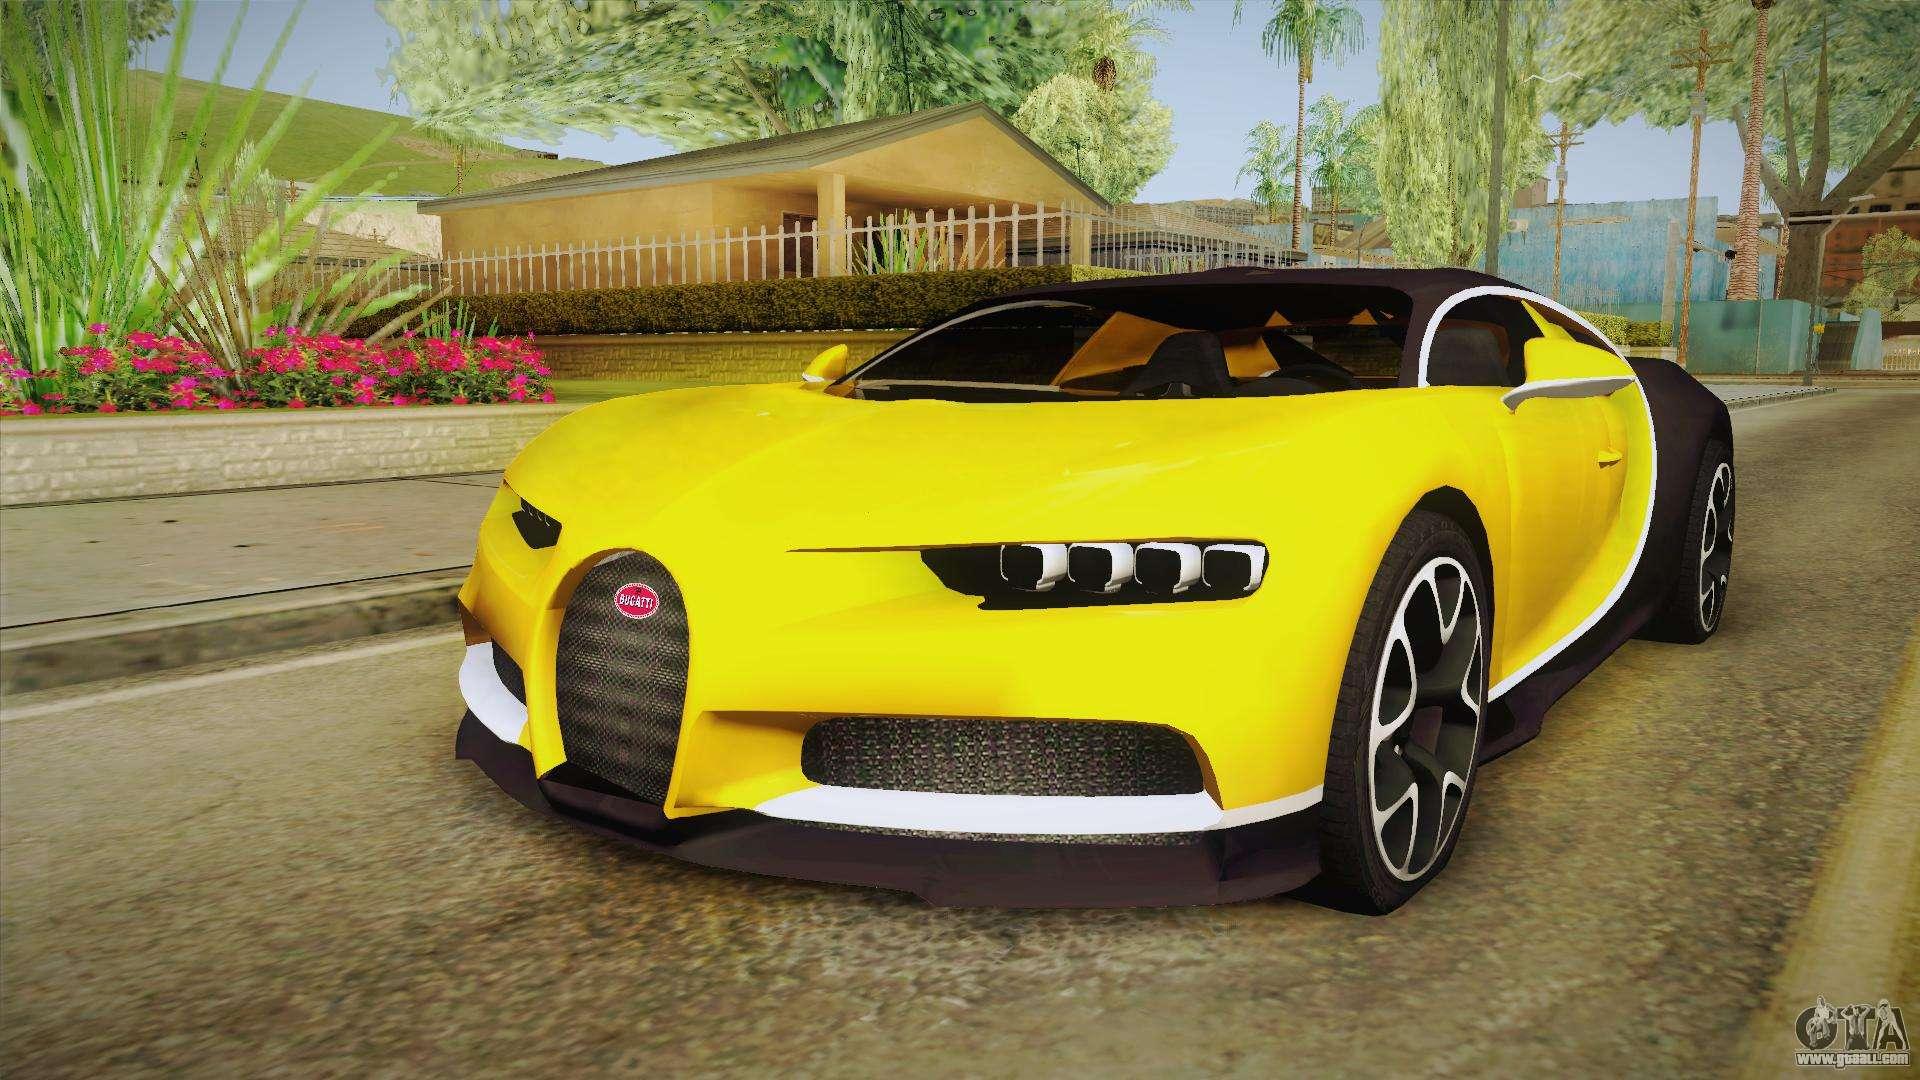 375350-gta-sa-2016-12-31-16-16-21-85 Terrific Bugatti Veyron Mod Gta Sa Cars Trend